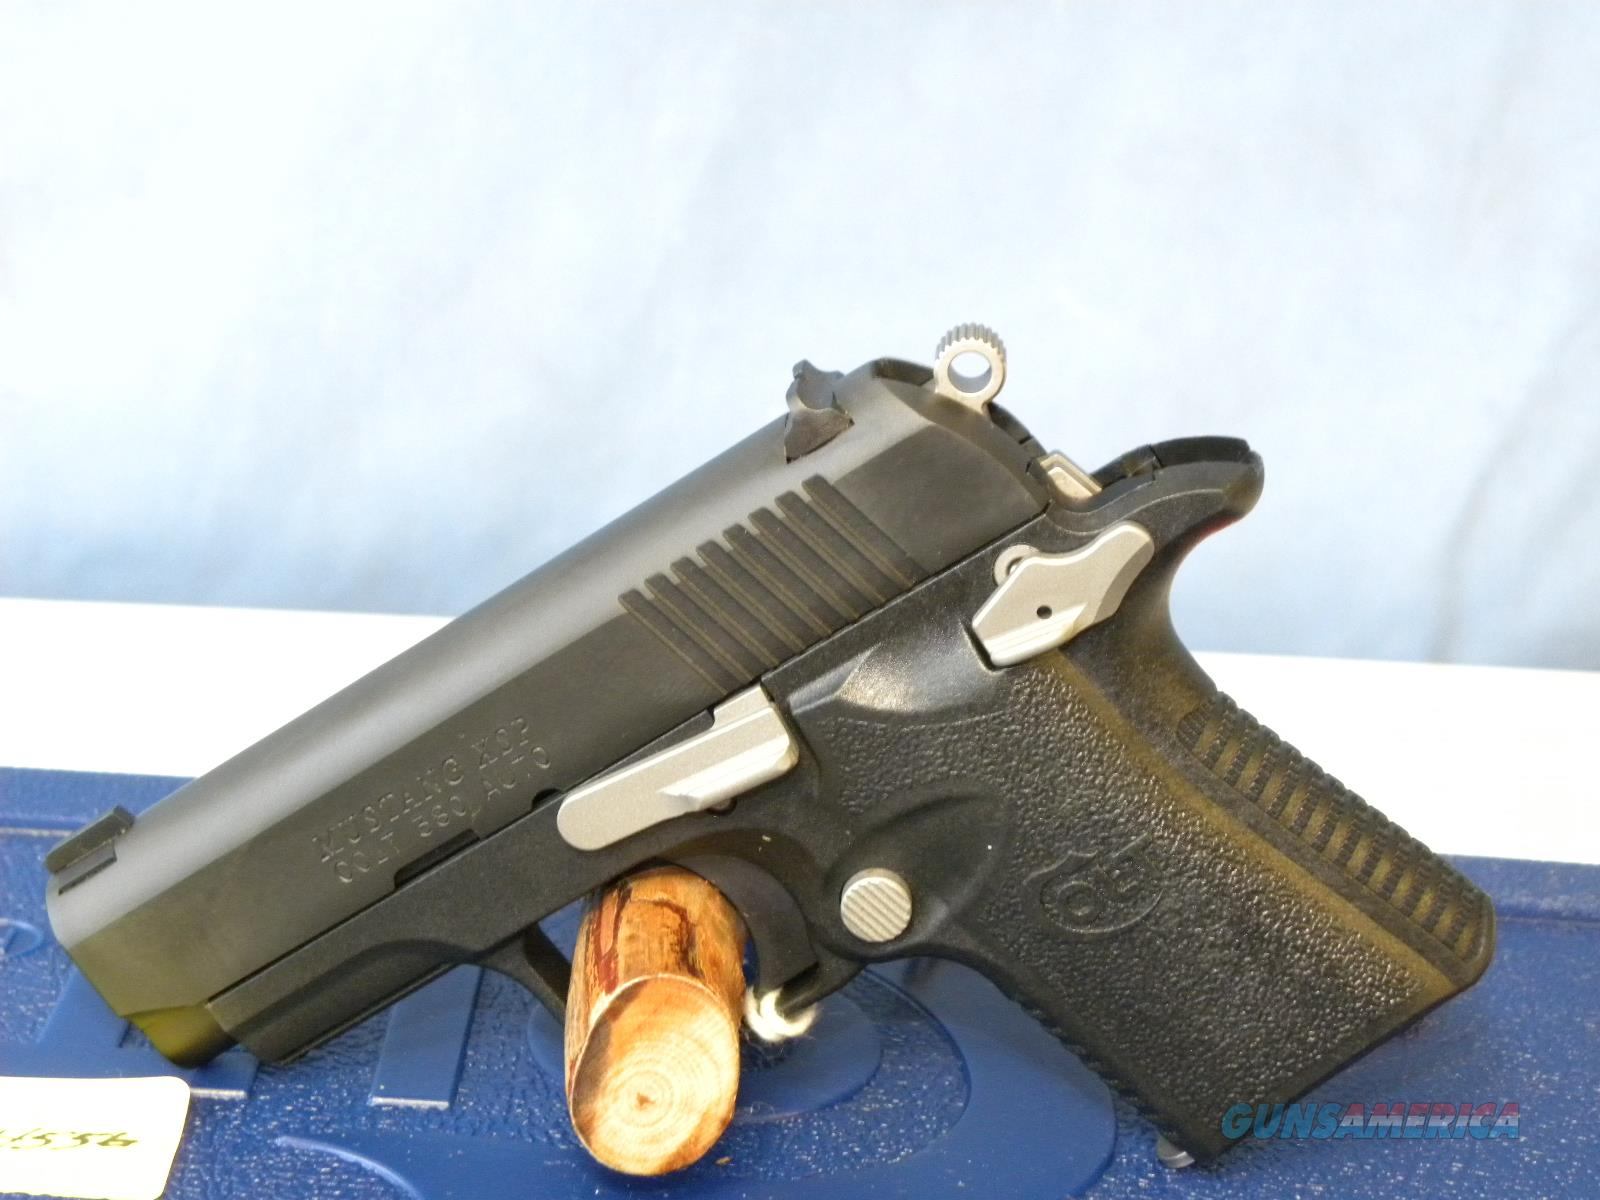 Colt Mustang XSP .380 06790  Guns > Pistols > Colt Automatic Pistols (.25, .32, & .380 cal)